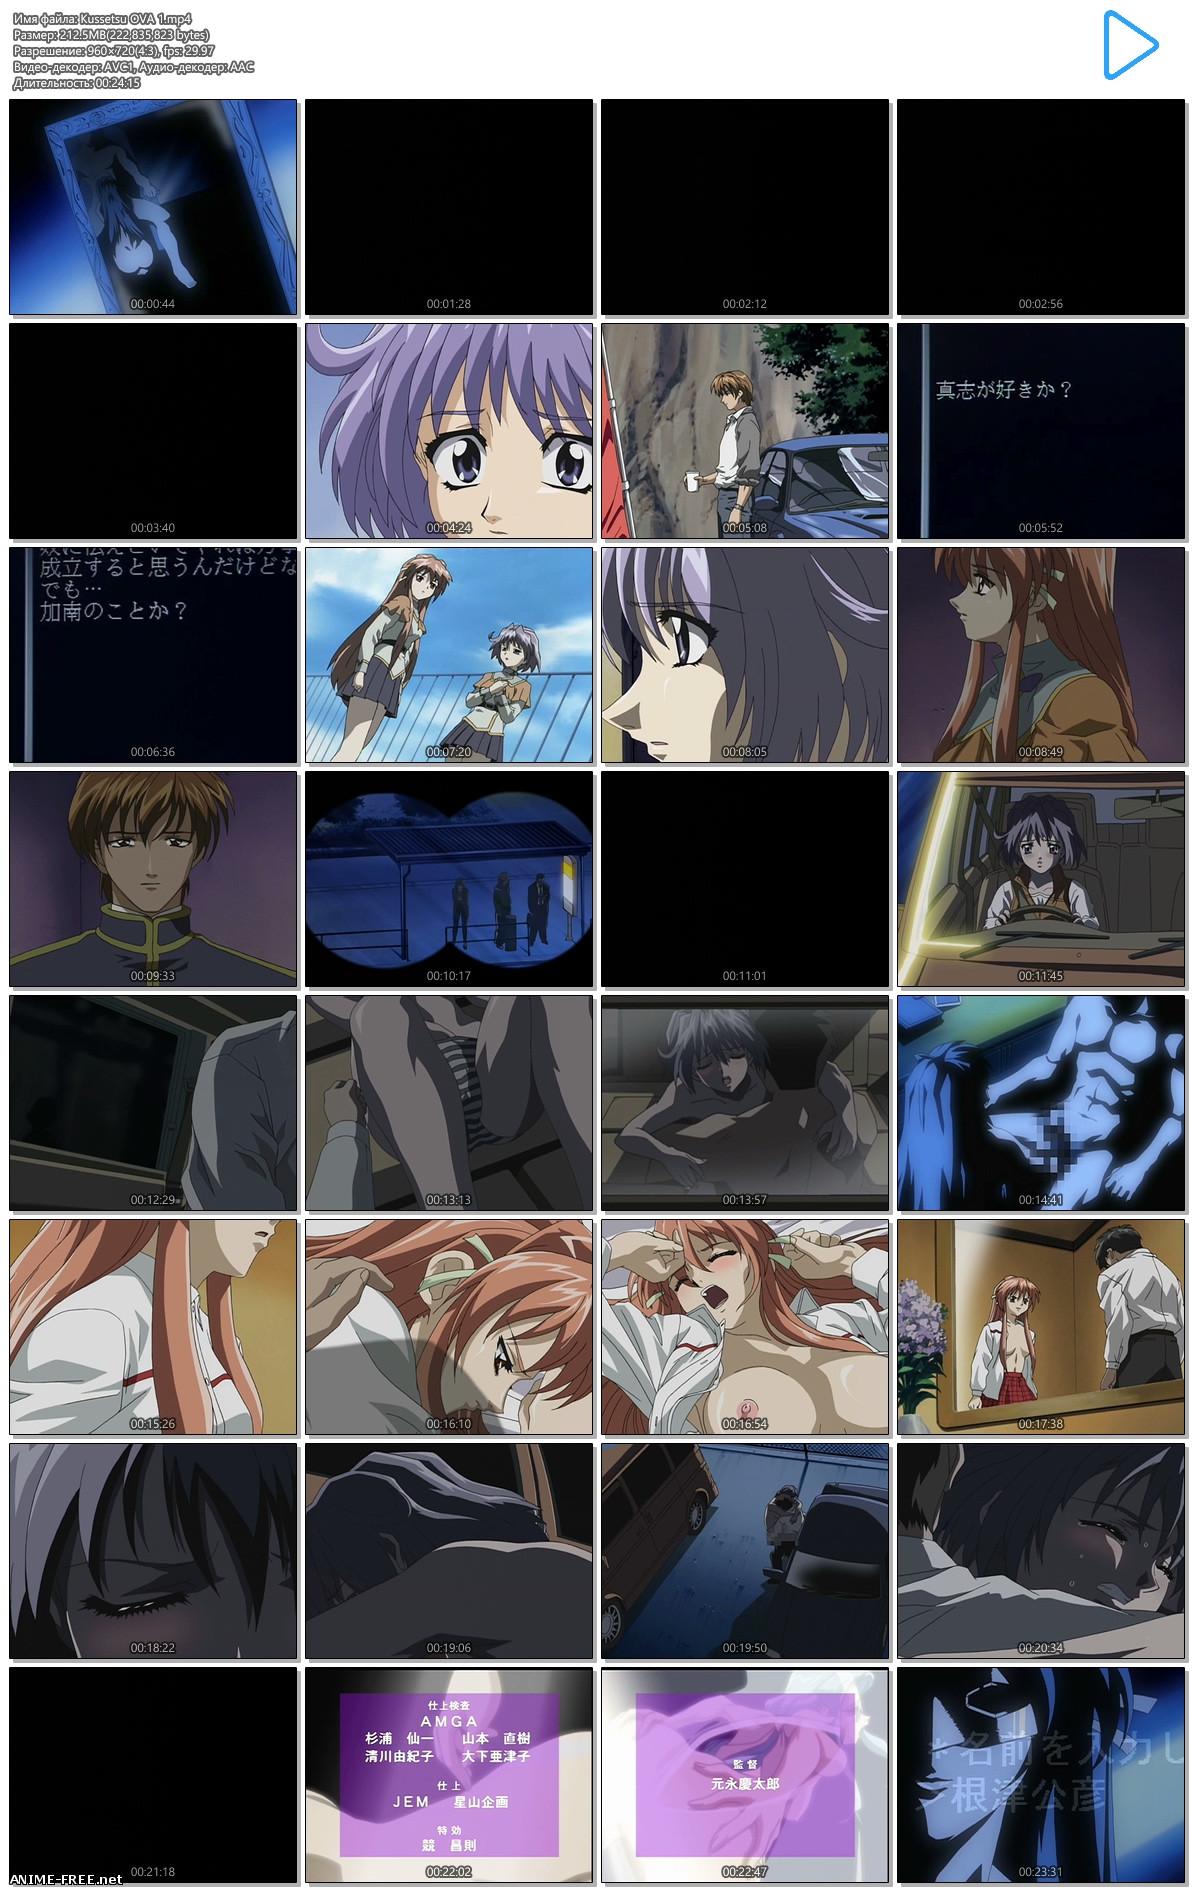 Kussetsu / На изгибе / Ни изломе [Ep.1-3] [ENG,RUS,JAP] [720p] Anime Hentai